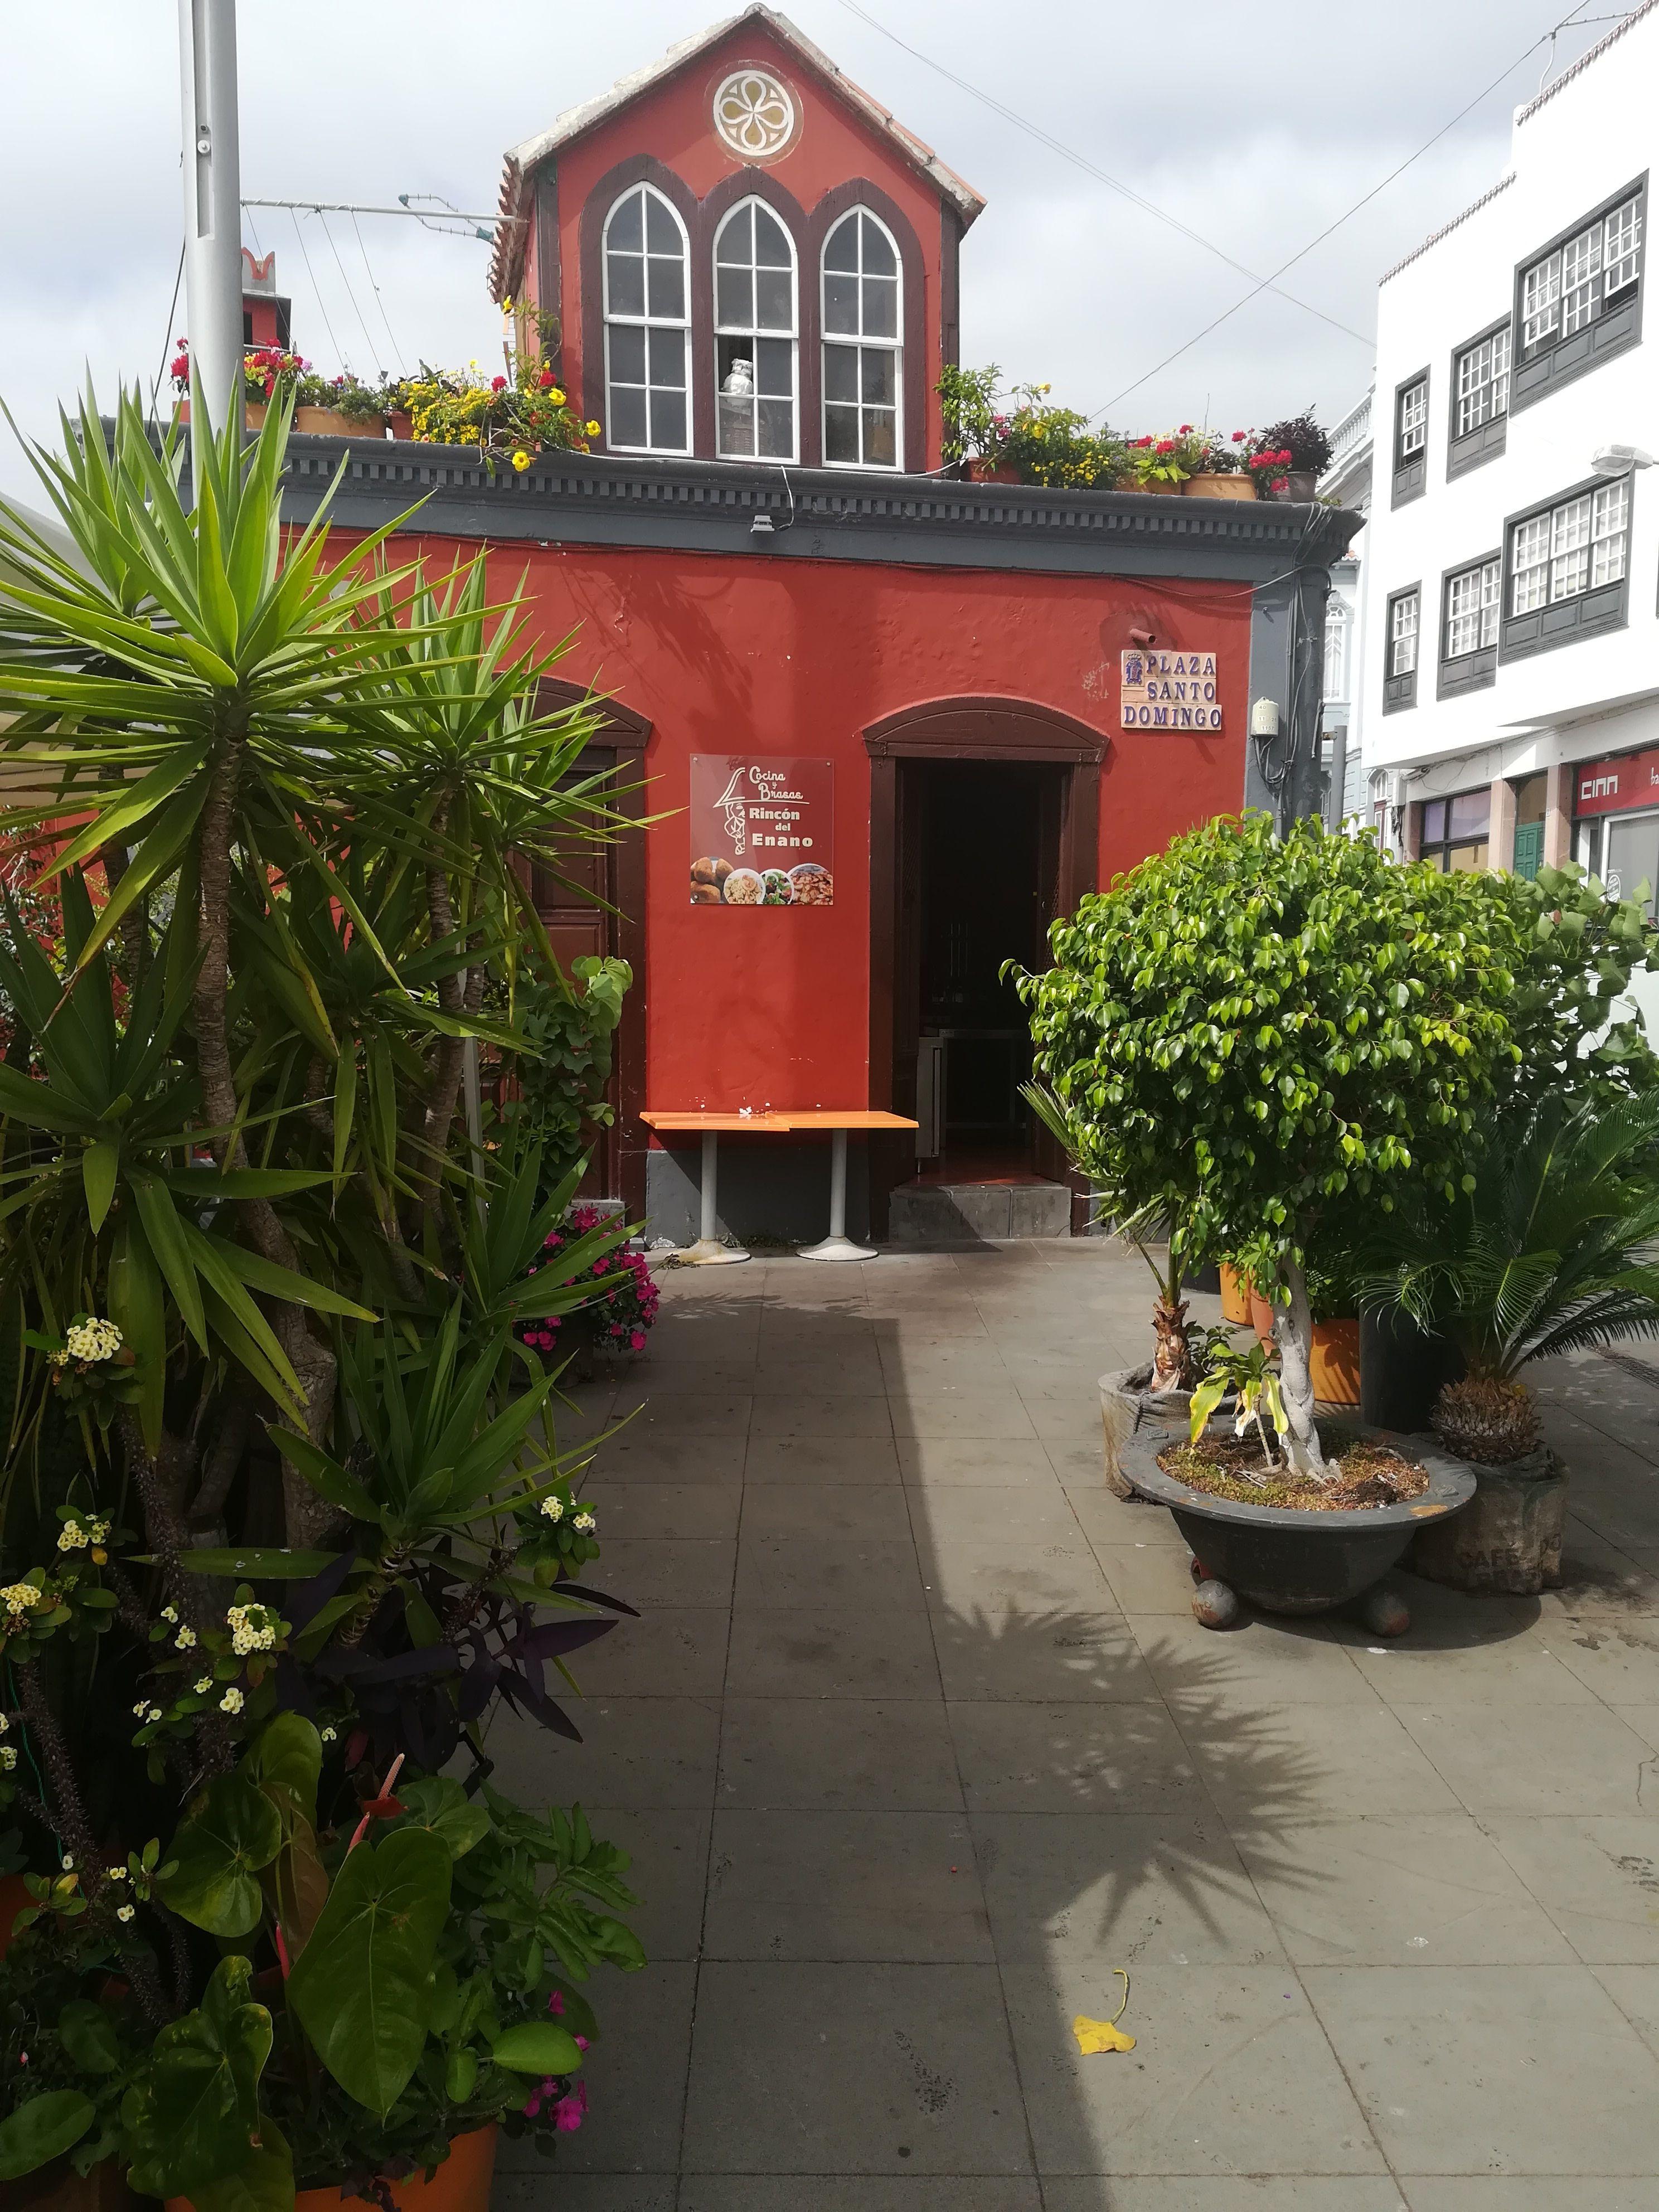 Where to eat in Santa Cruz de La Palma